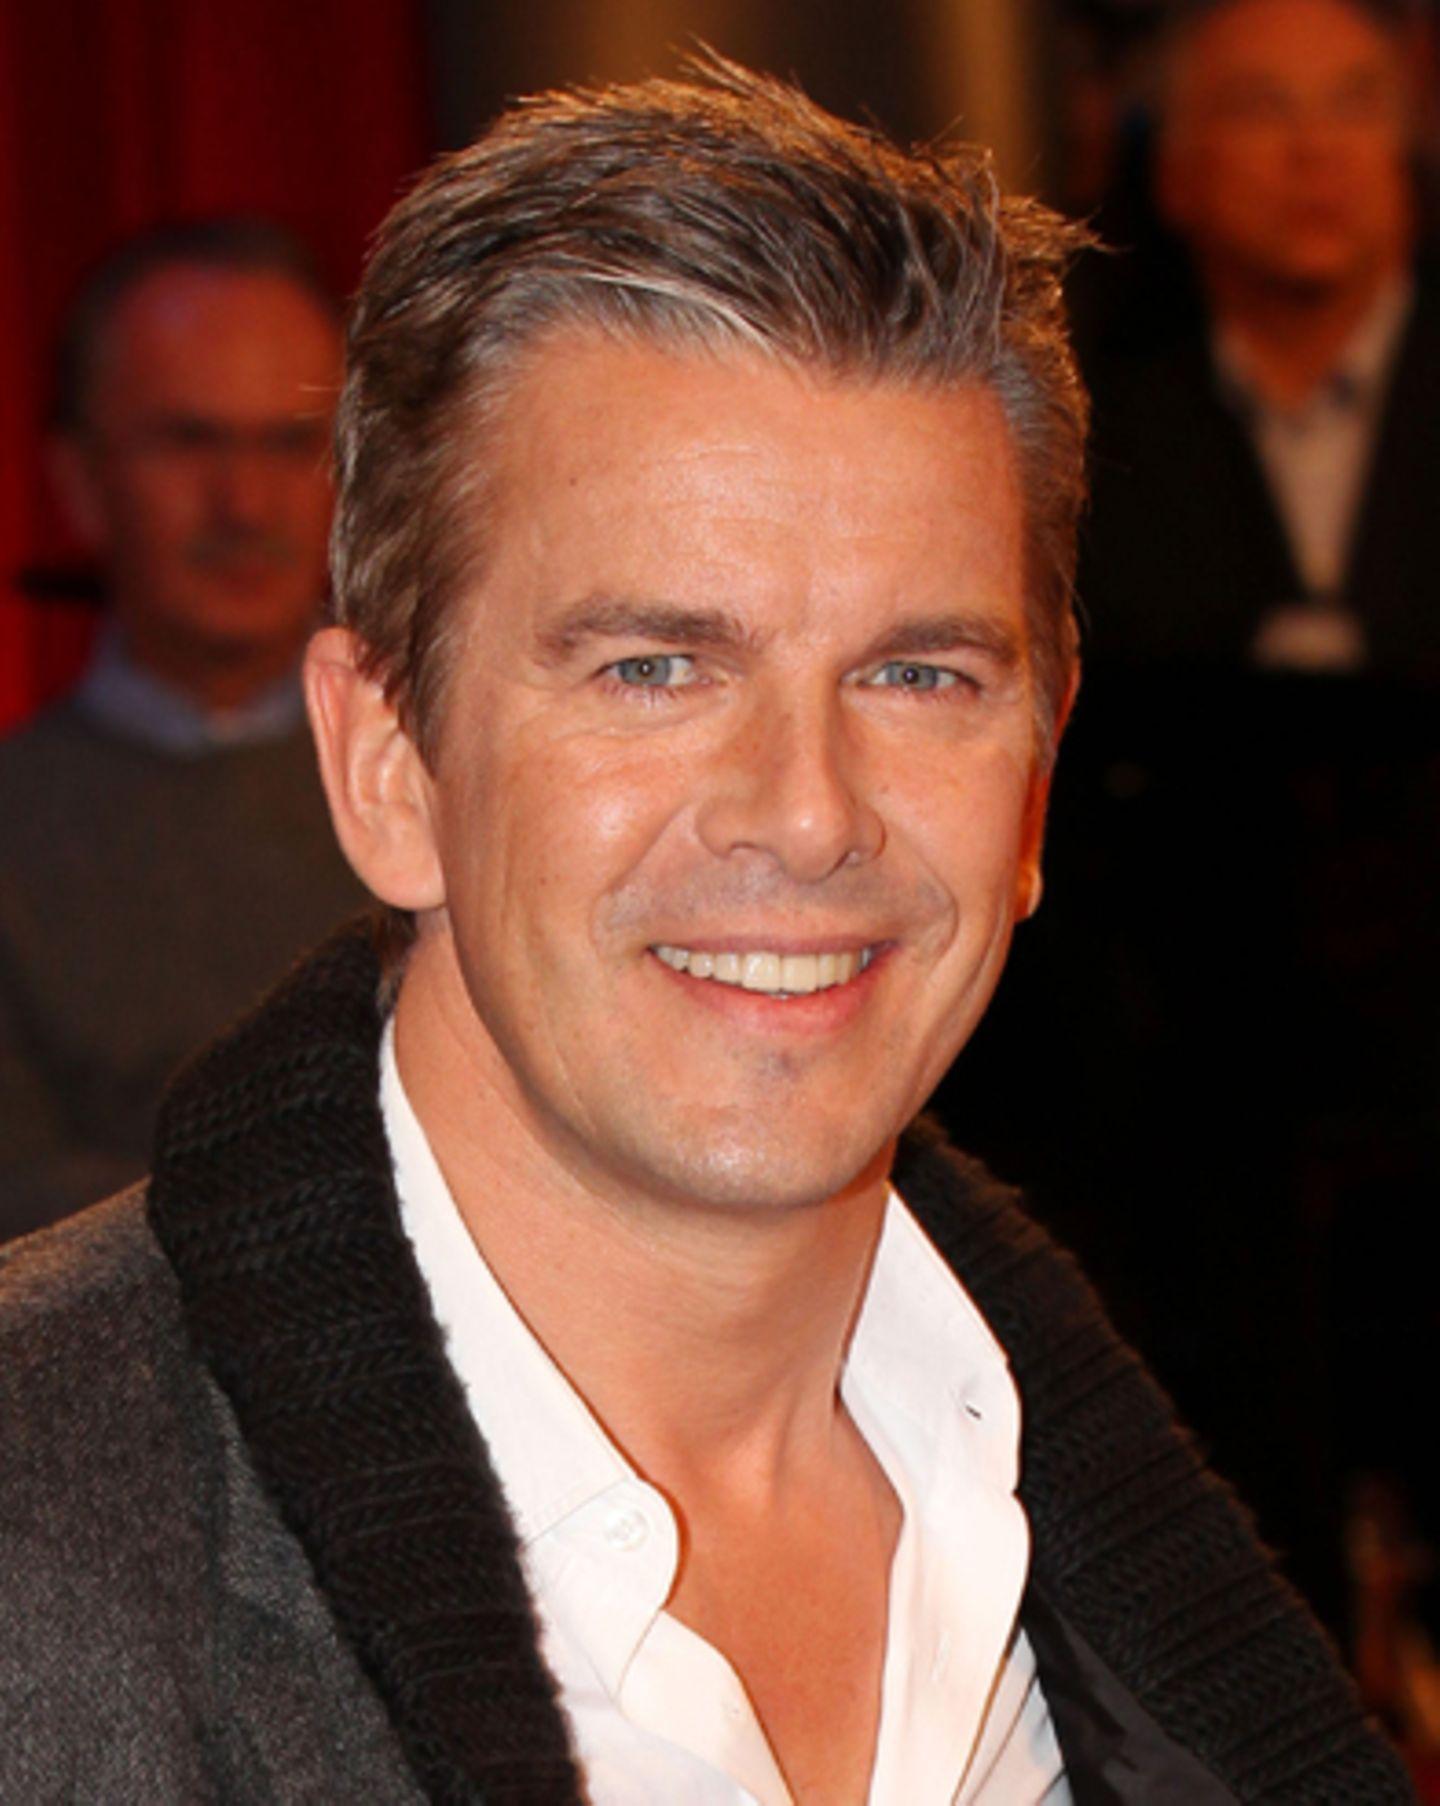 Markus Lanz